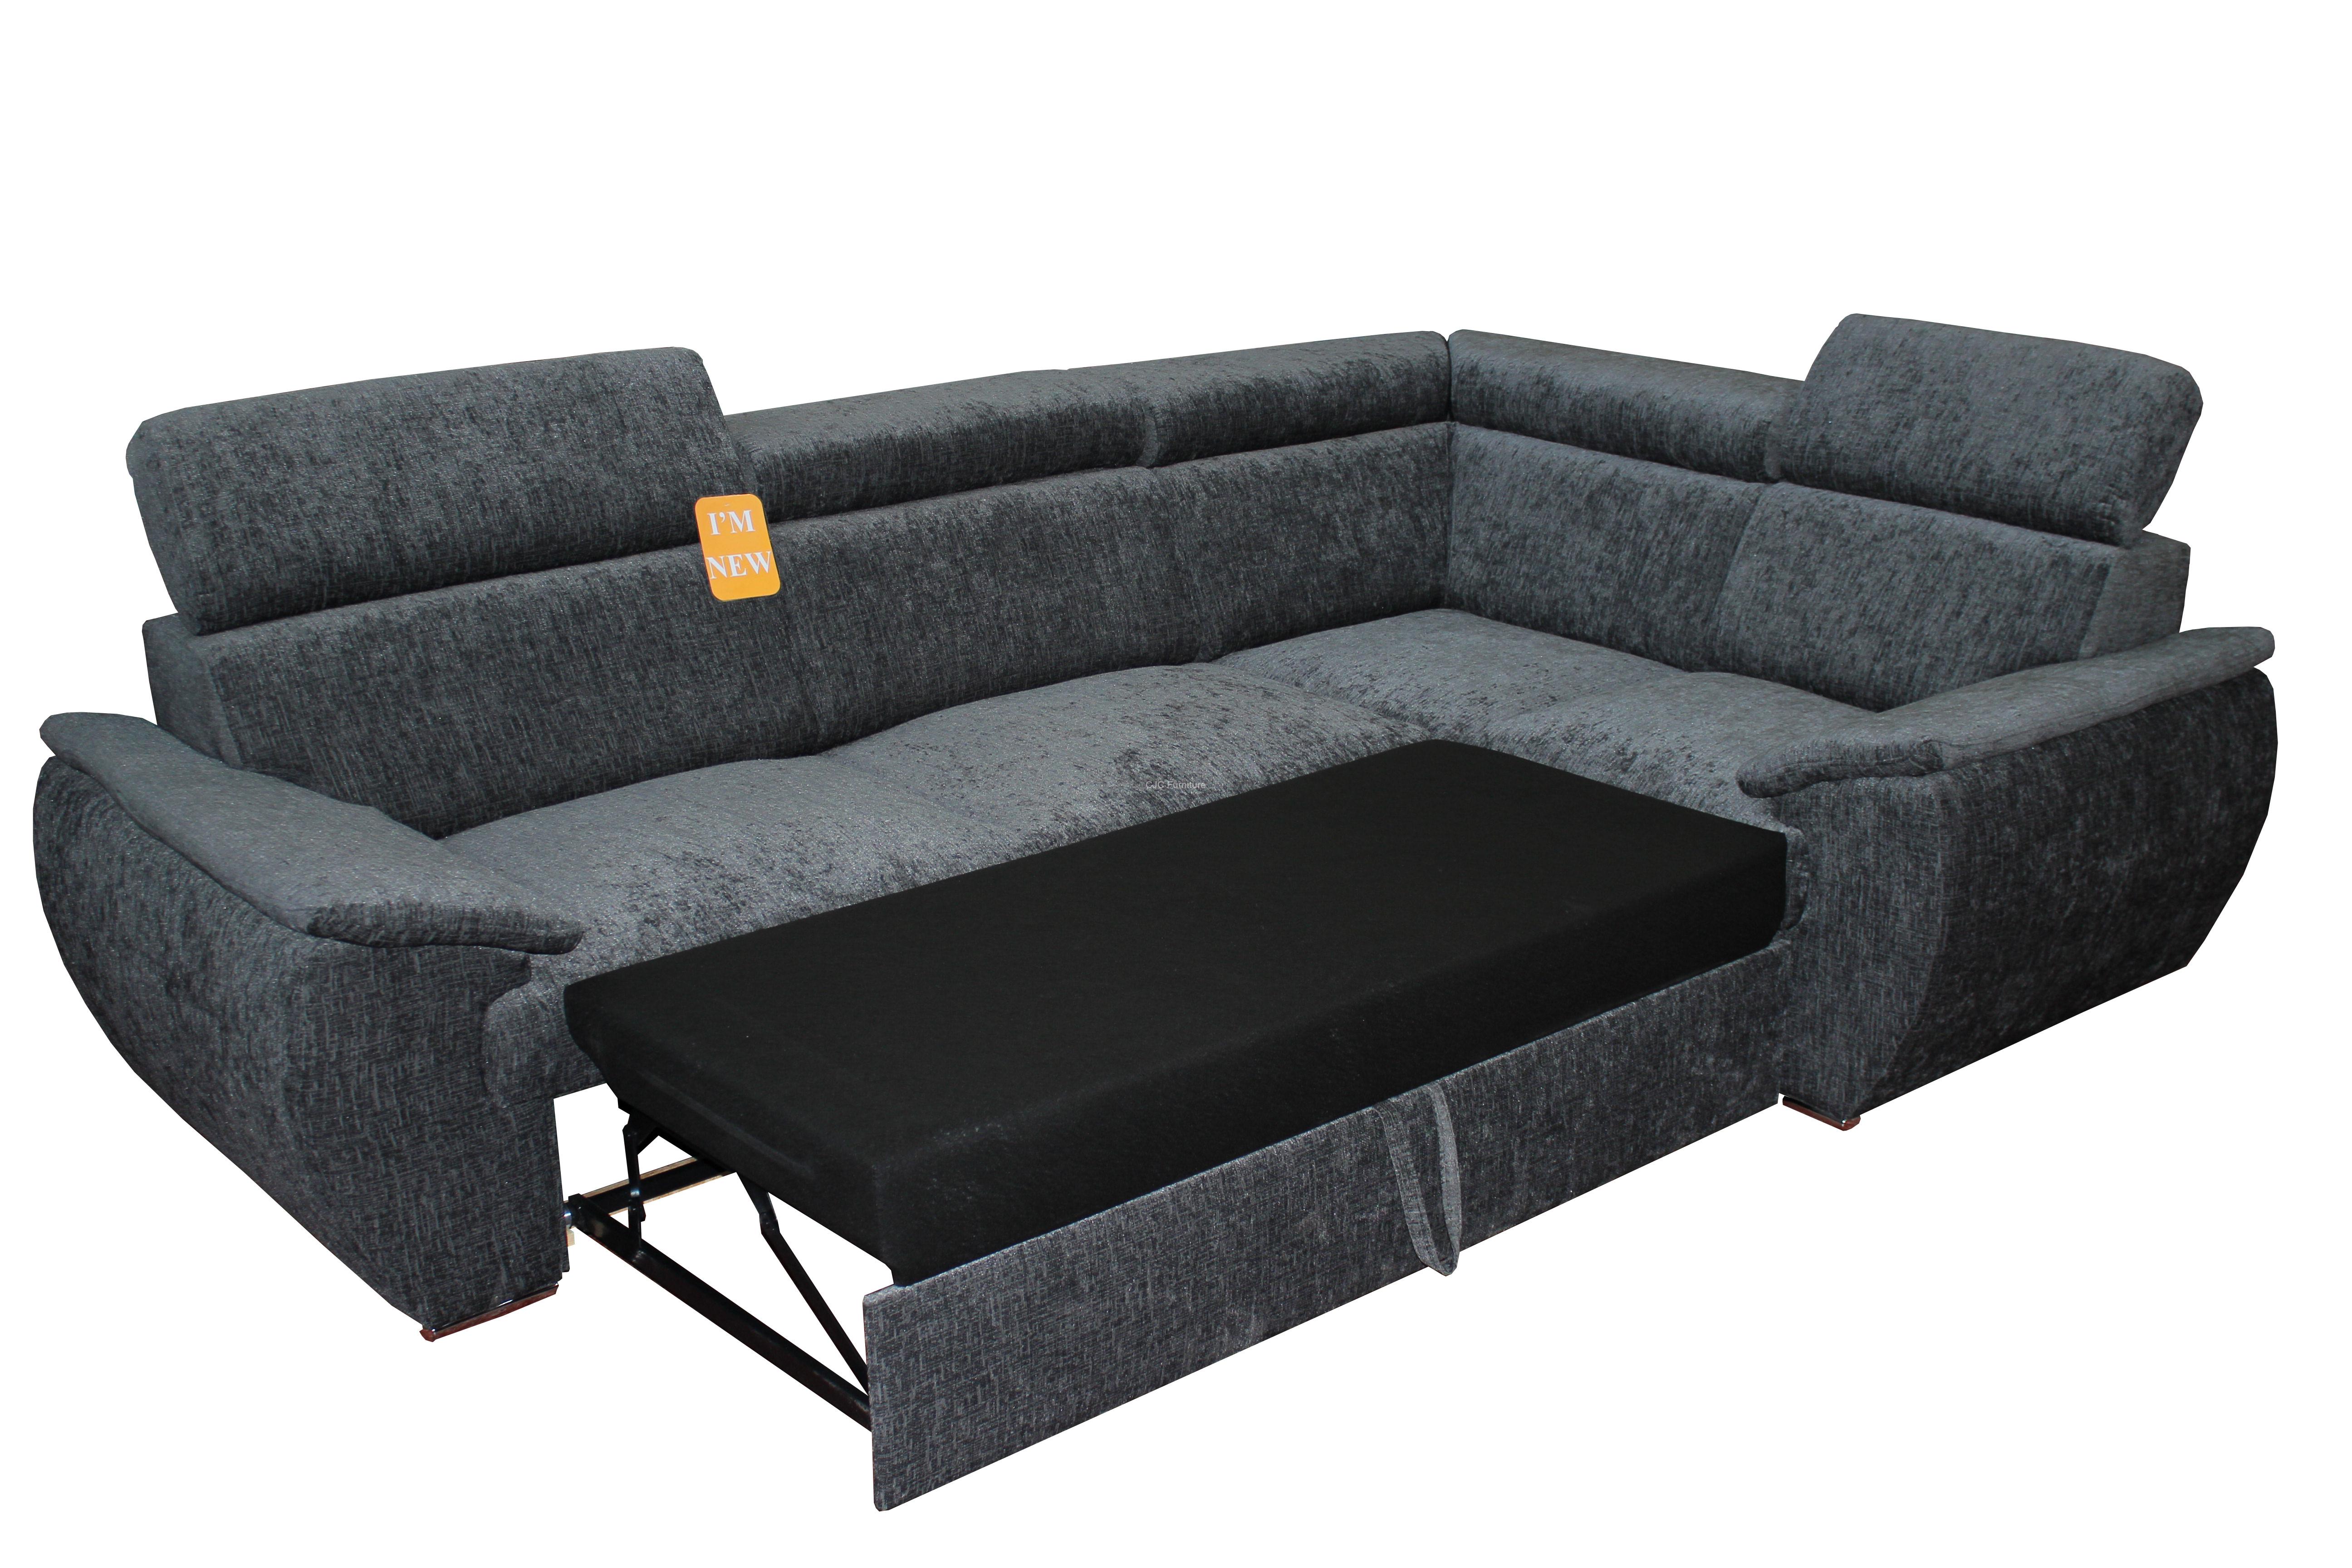 diamant corner sofa bed right handed WGIIIMT